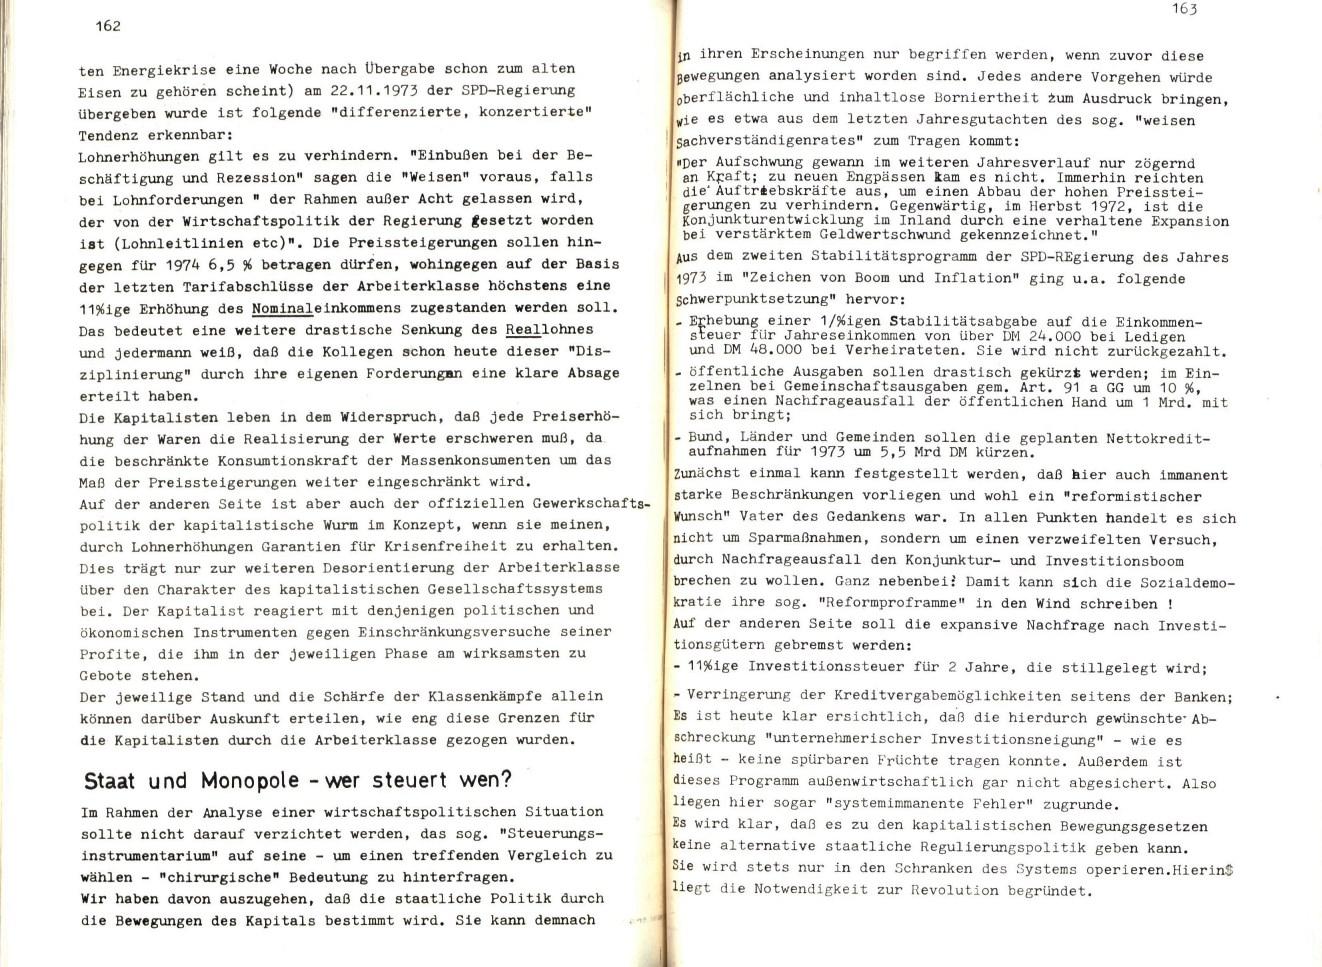 Bochum_IGM_Opel_PG_Opel_streikt_1973_084